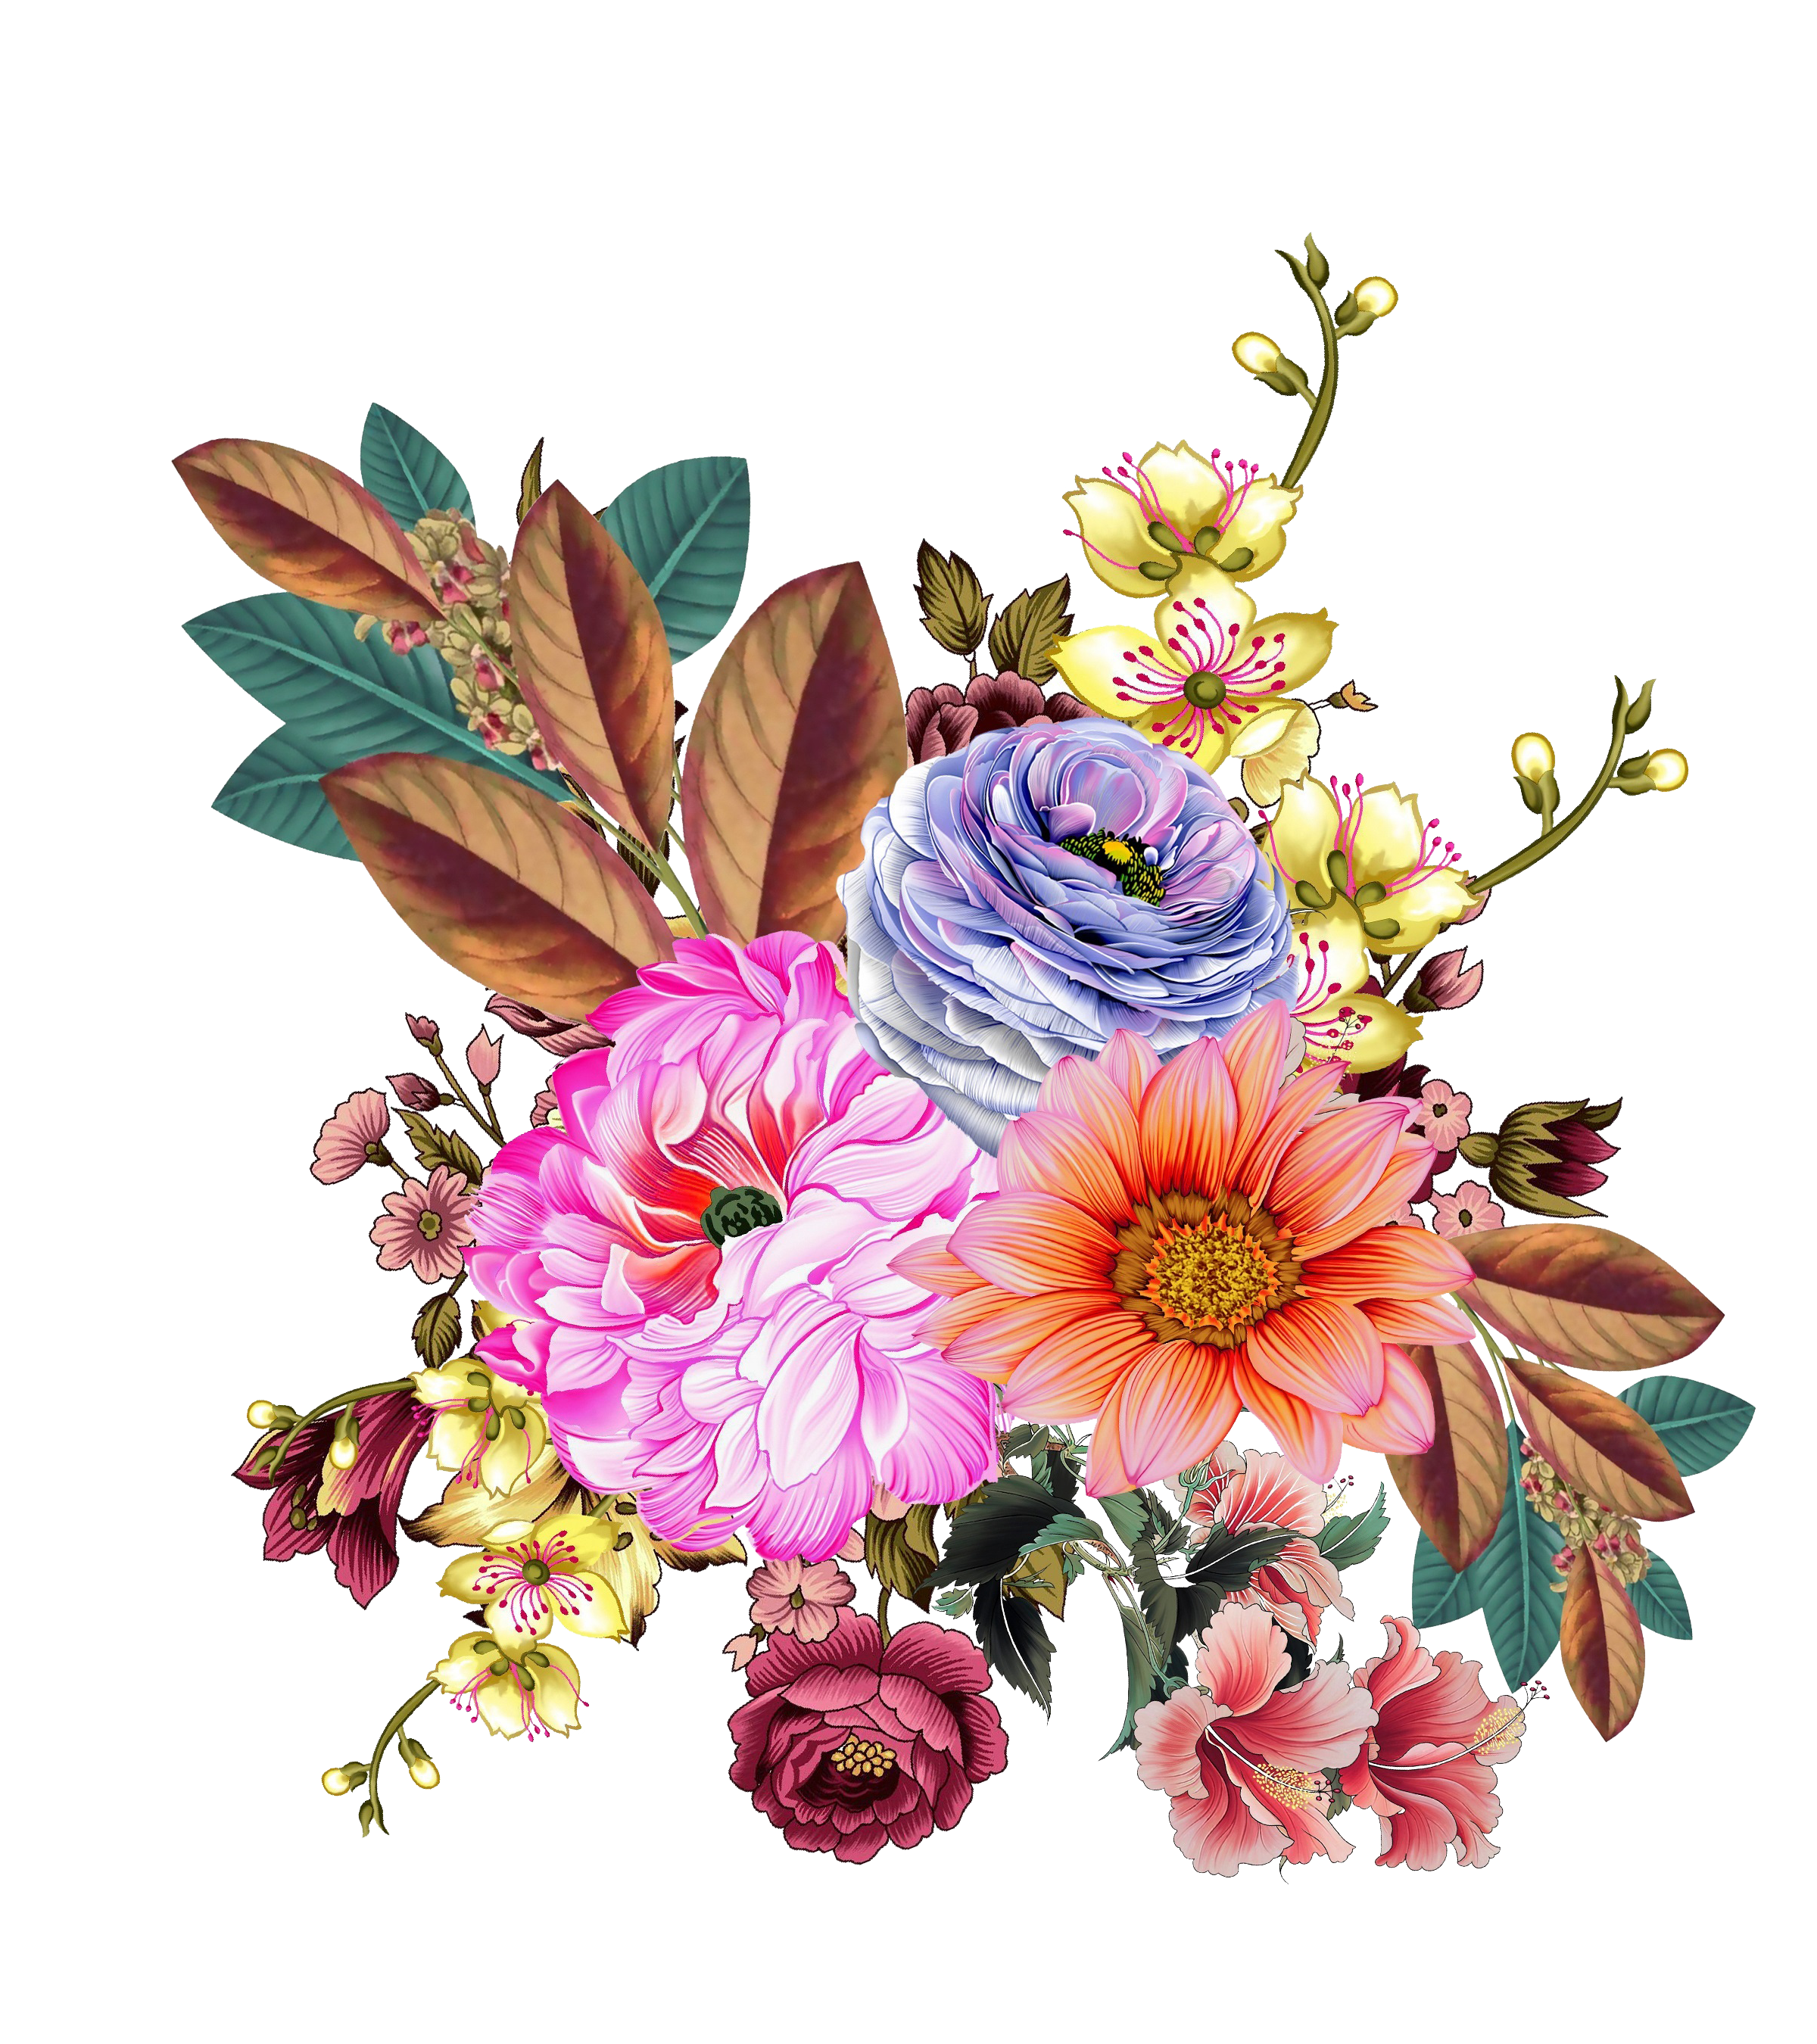 Pin by seharmunawar on draw motif in 2020 Flower